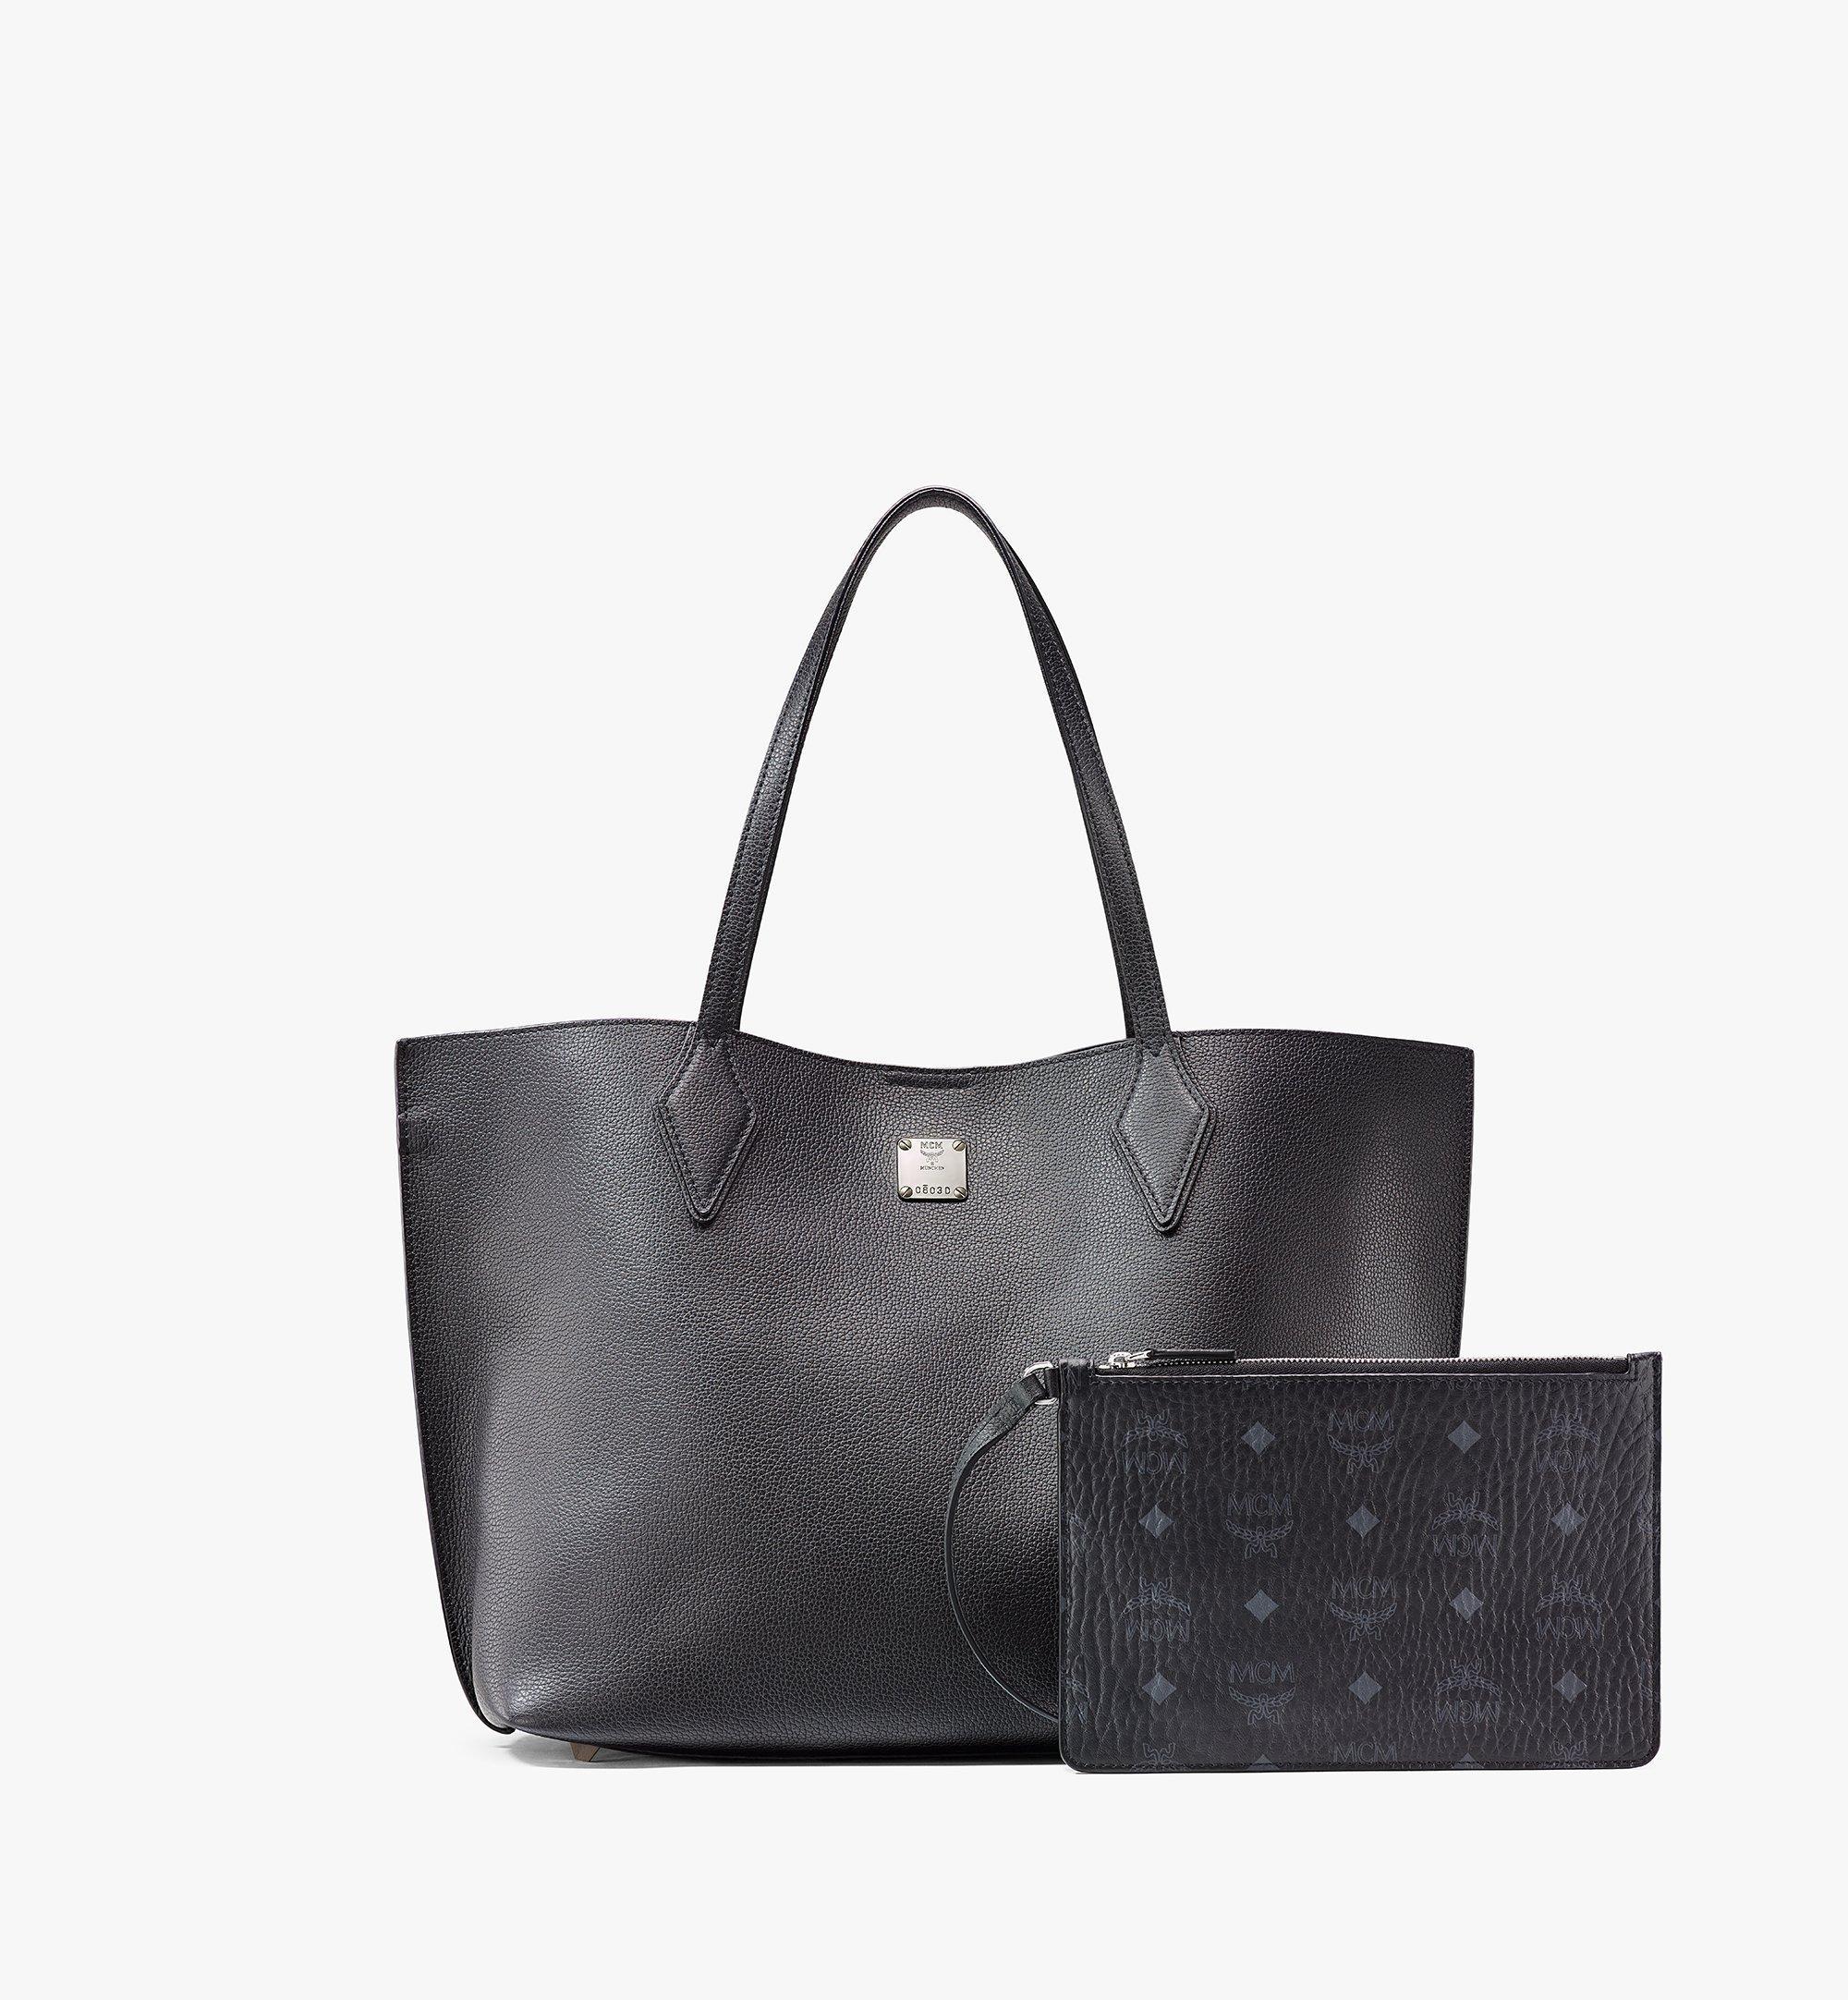 MCM Yris Tani 皮革購物袋 Black MWPAAYS01BK001 更多視圖 5